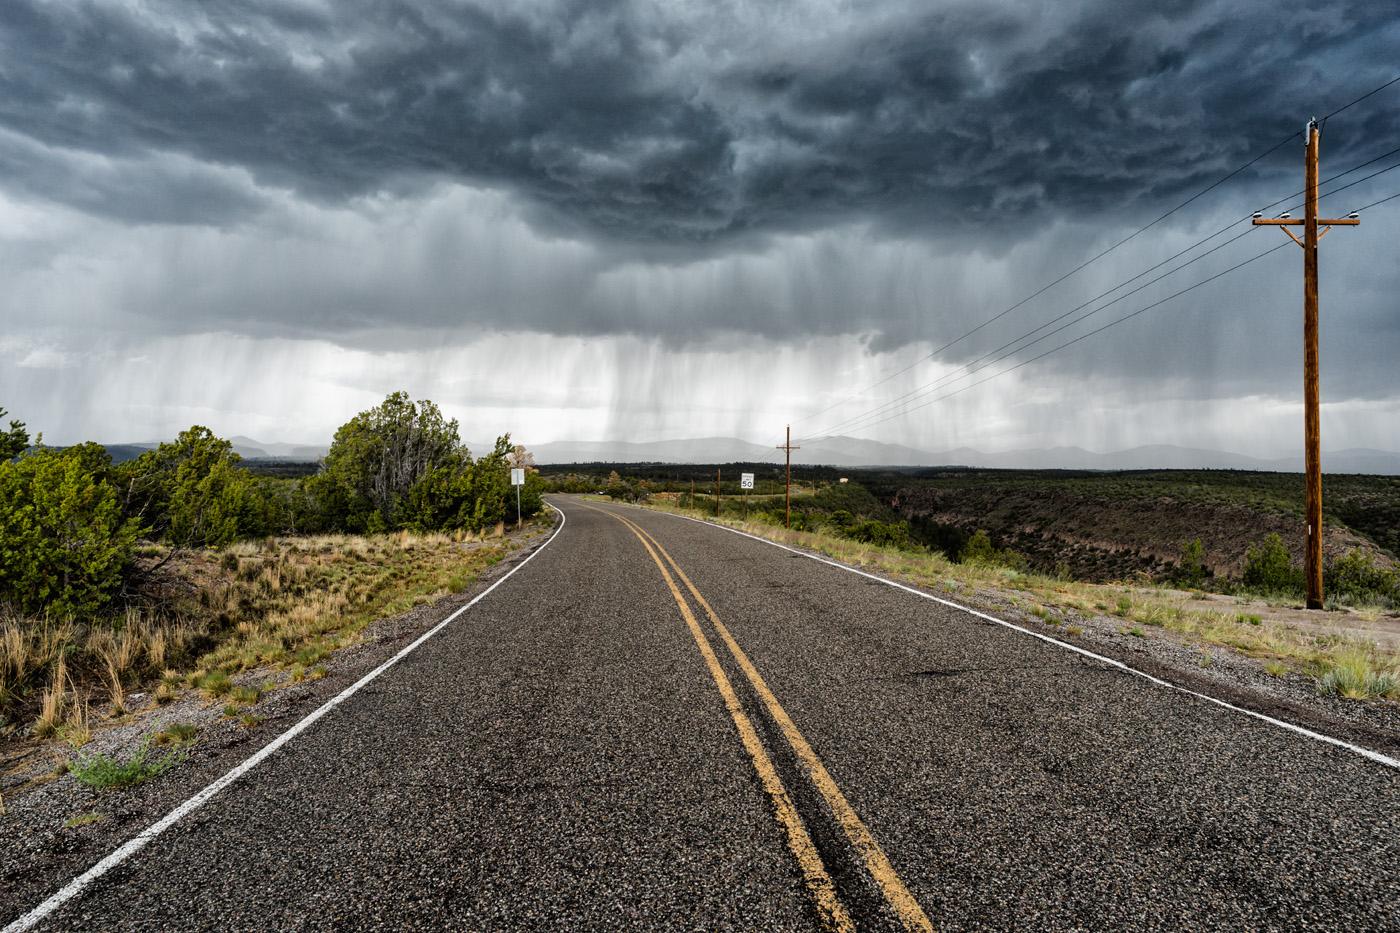 Rain Never Surrenders | 2014